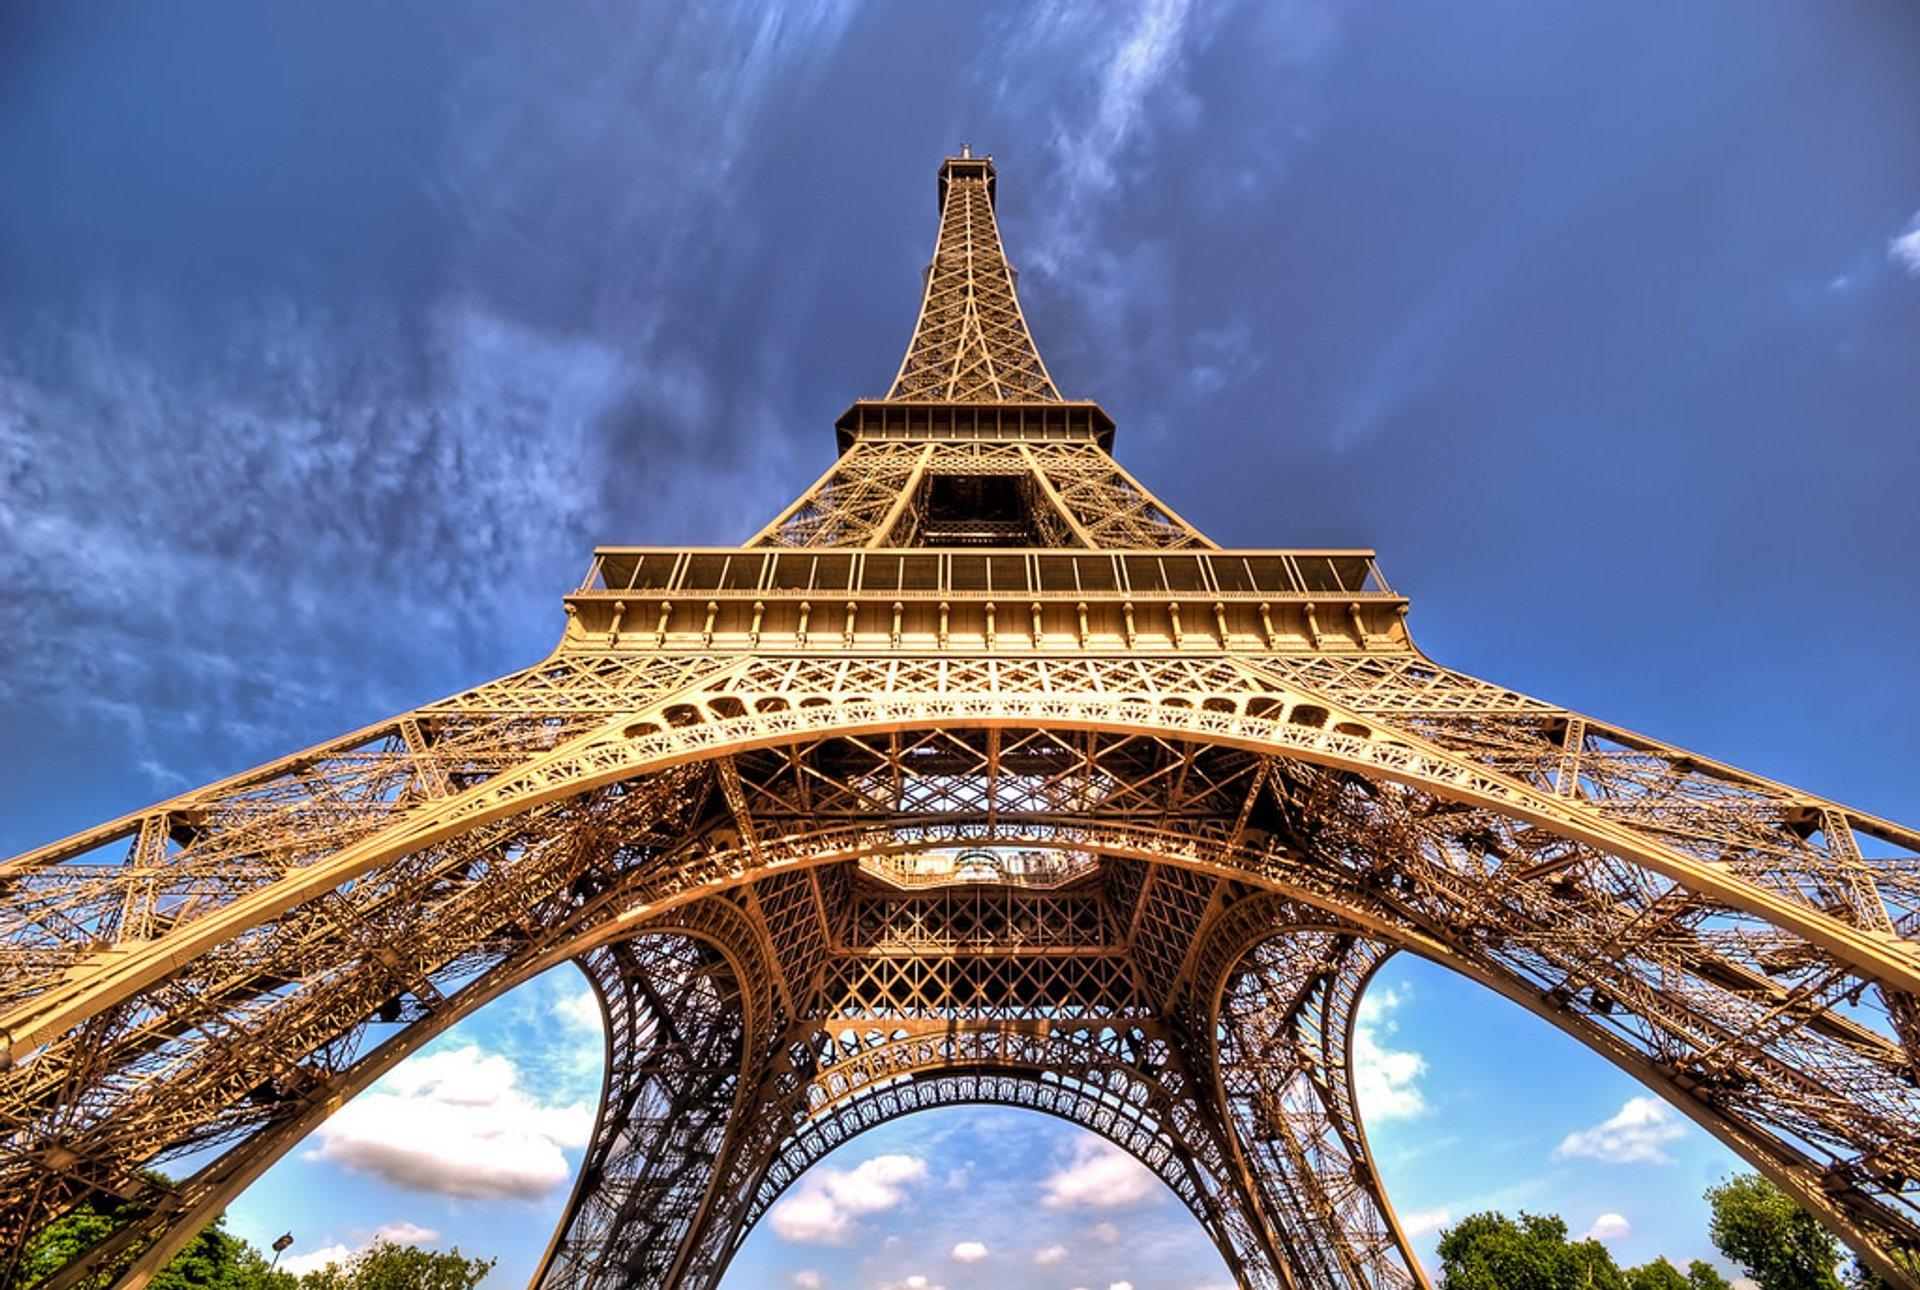 Eiffel Tower in Paris 2020 - Best Time